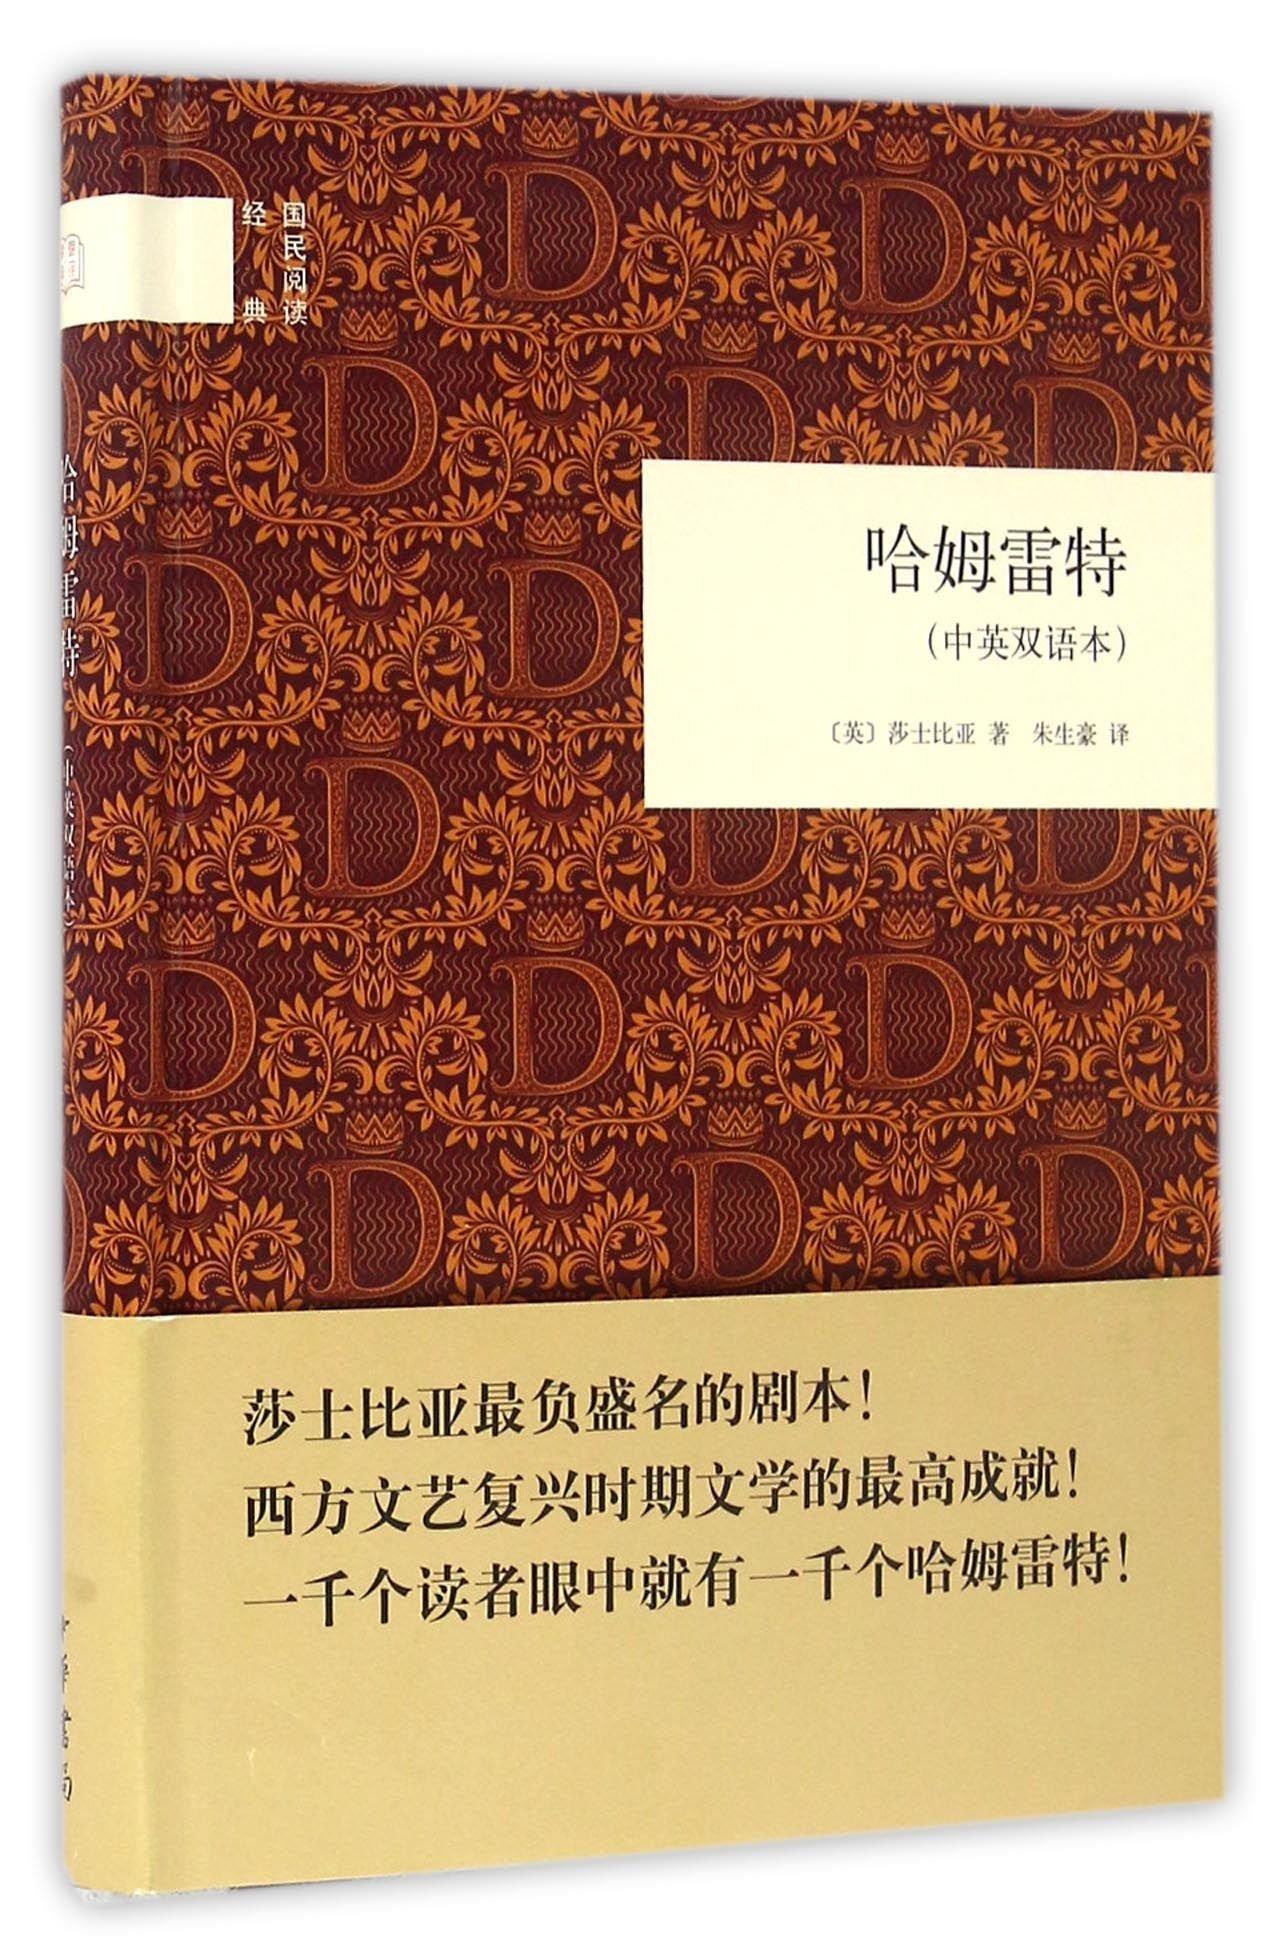 Download 哈姆雷特(中英双语本)(精)/国民阅读经典 pdf